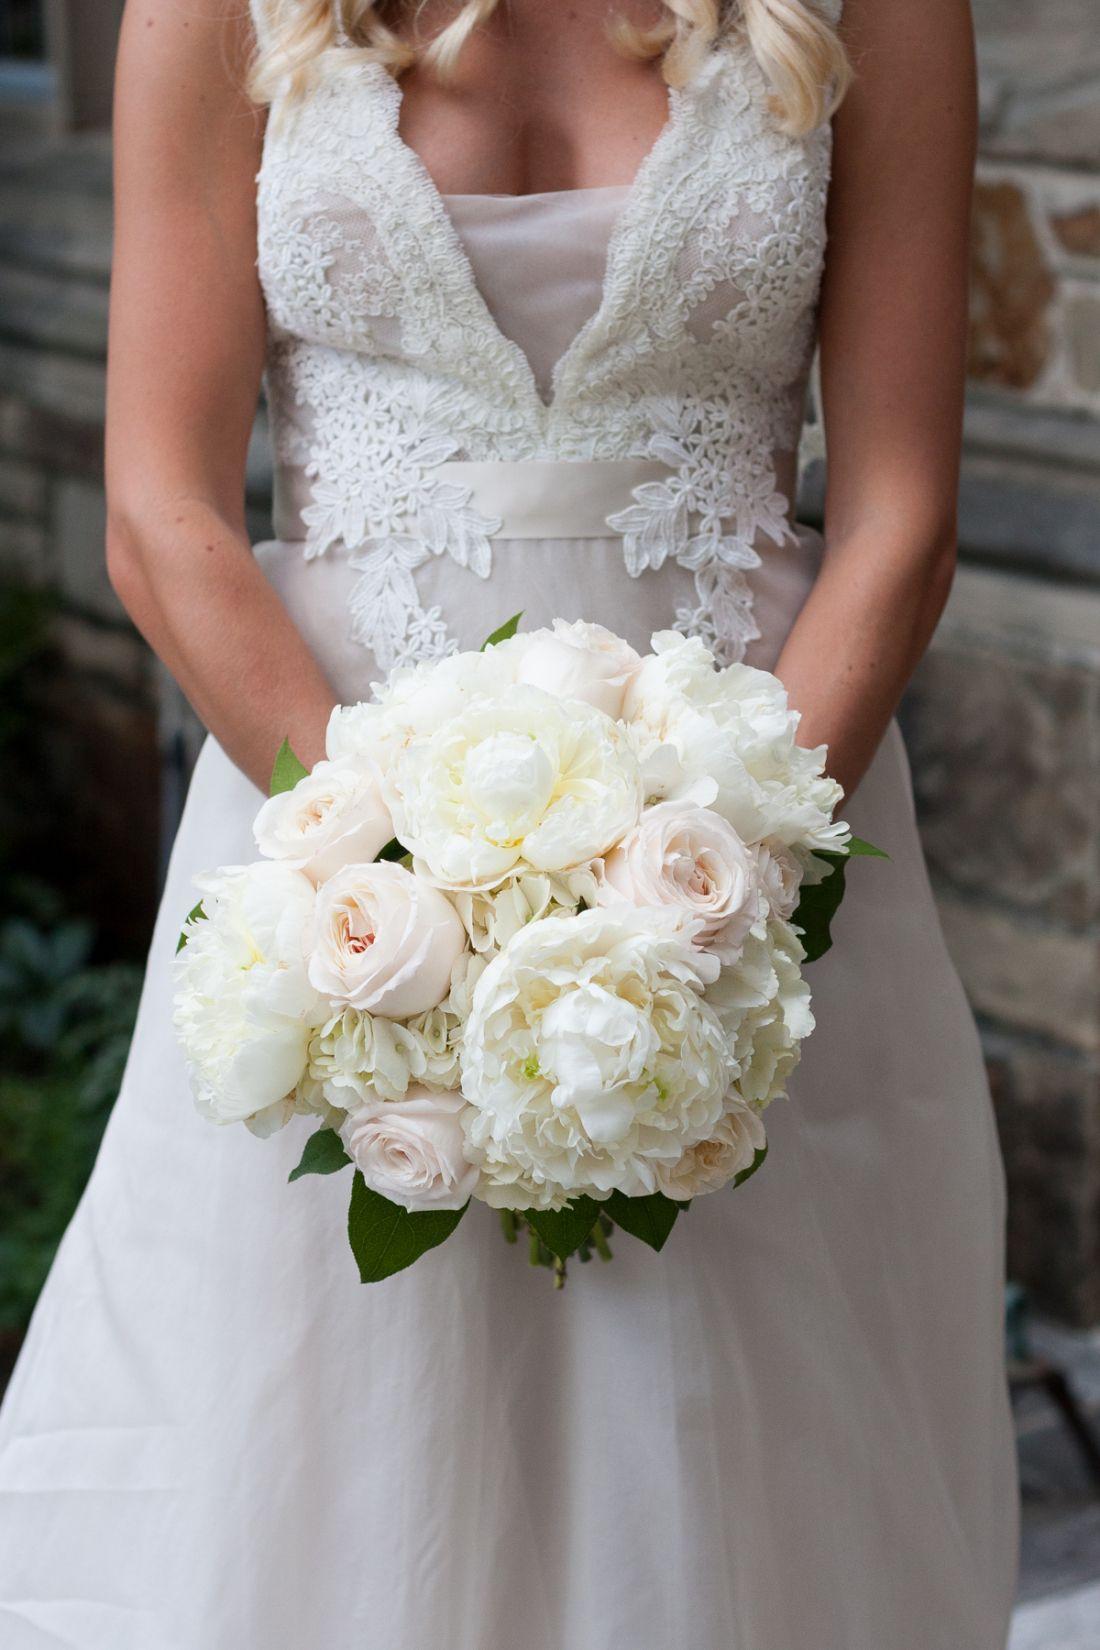 Outdoor summer wedding dresses  Weddings  Wedding Flowers  Pinterest  Destination weddings